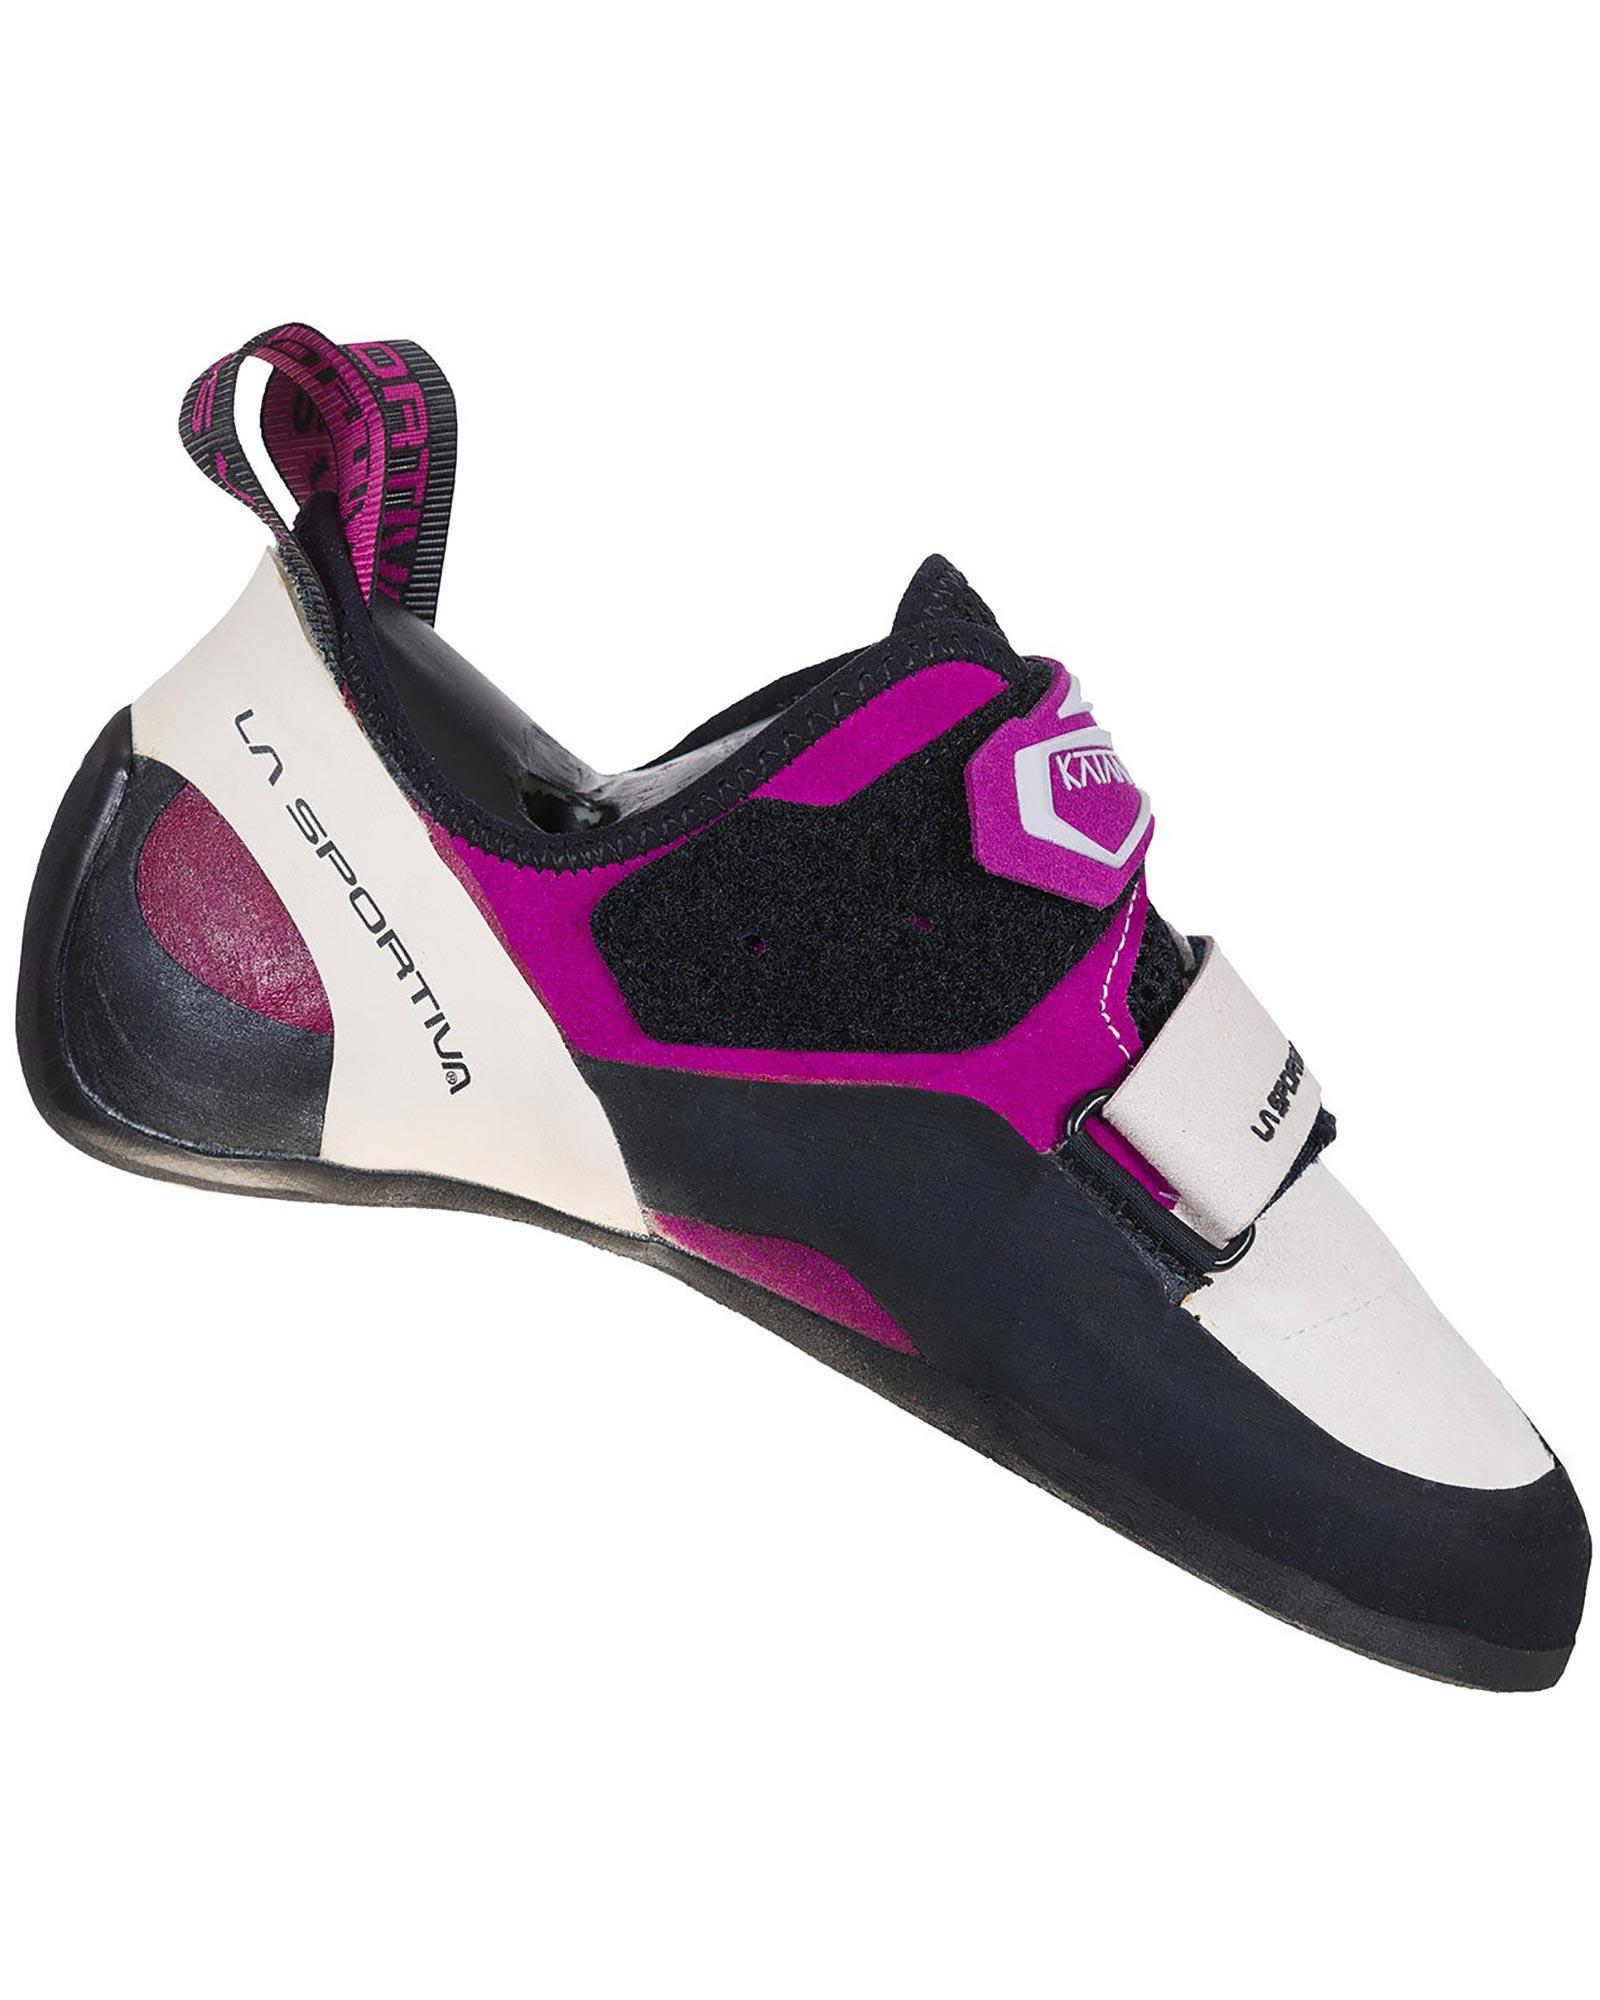 La Sportiva Women's Katana Climbing Shoes 0